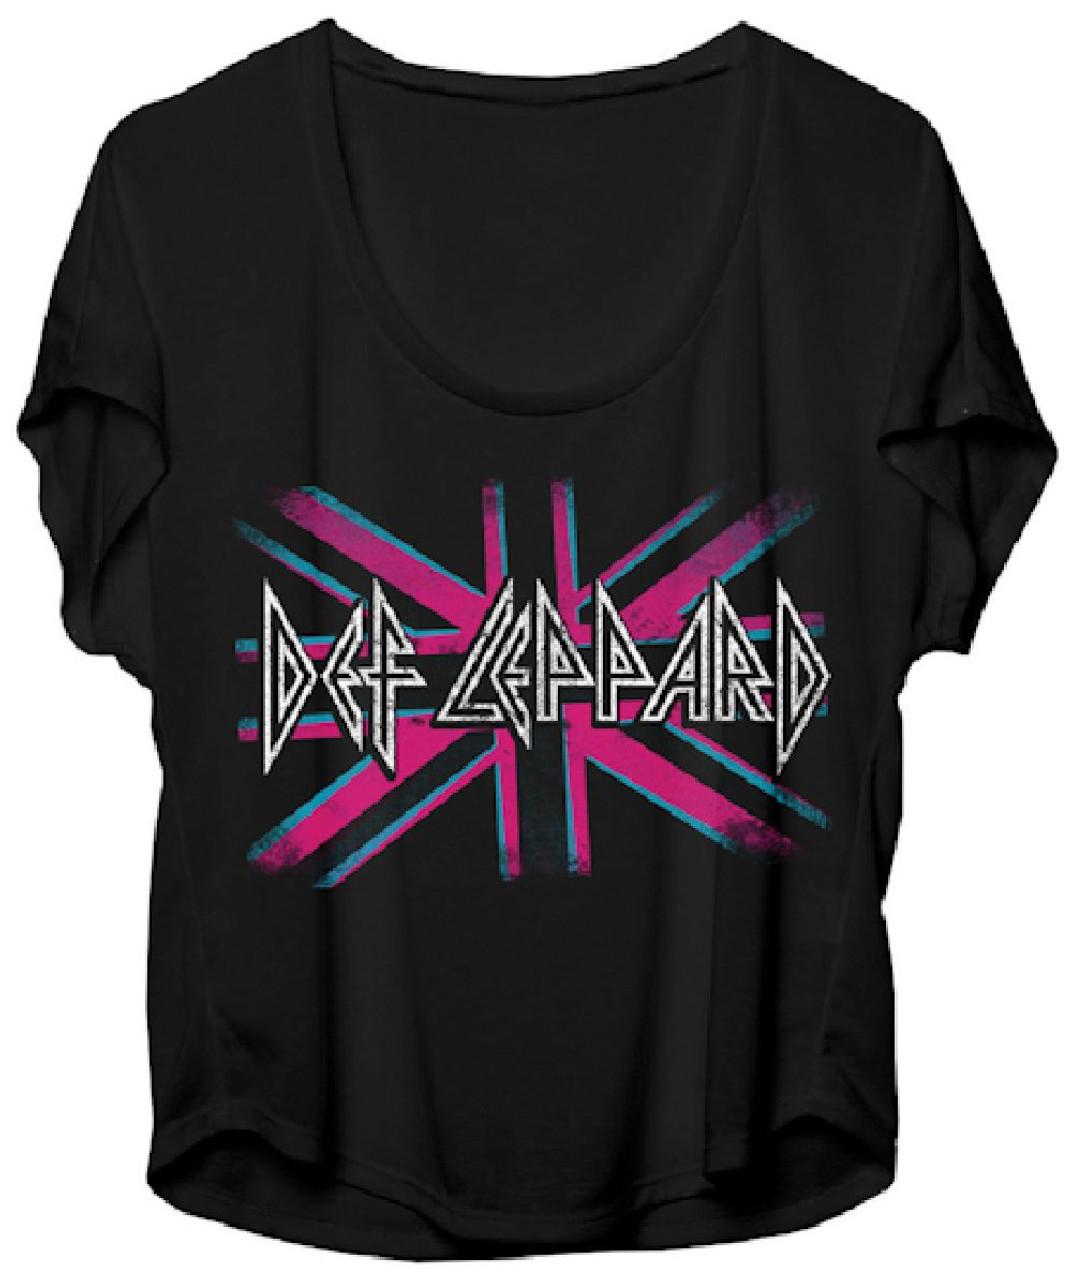 f56f4c6d1af Def Leppard Women s T-shirt - British Flag Logo. Black Dolman Shirt ...